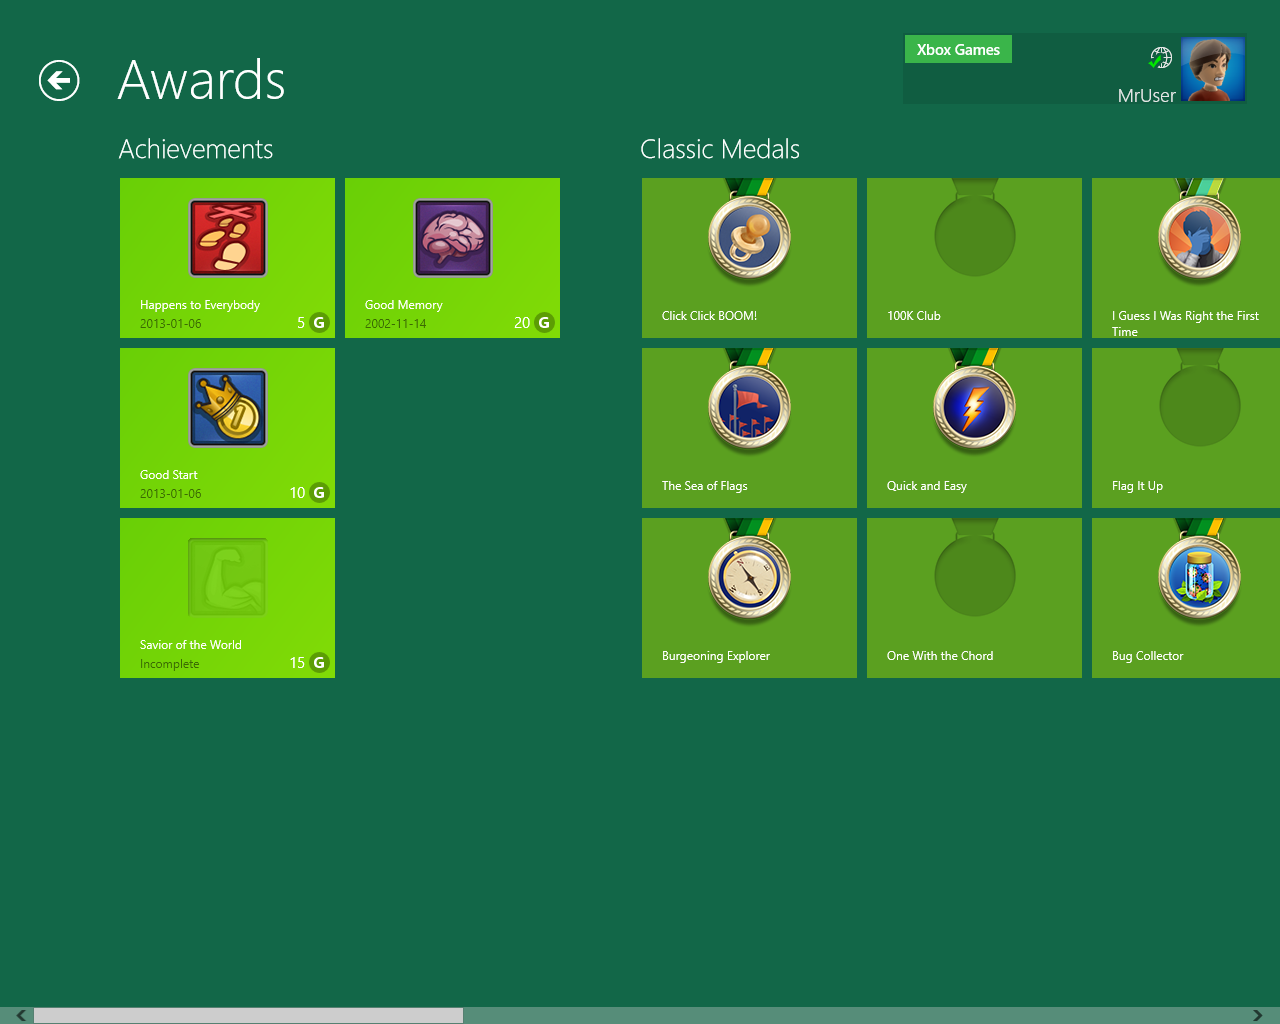 Minesweeper achievements